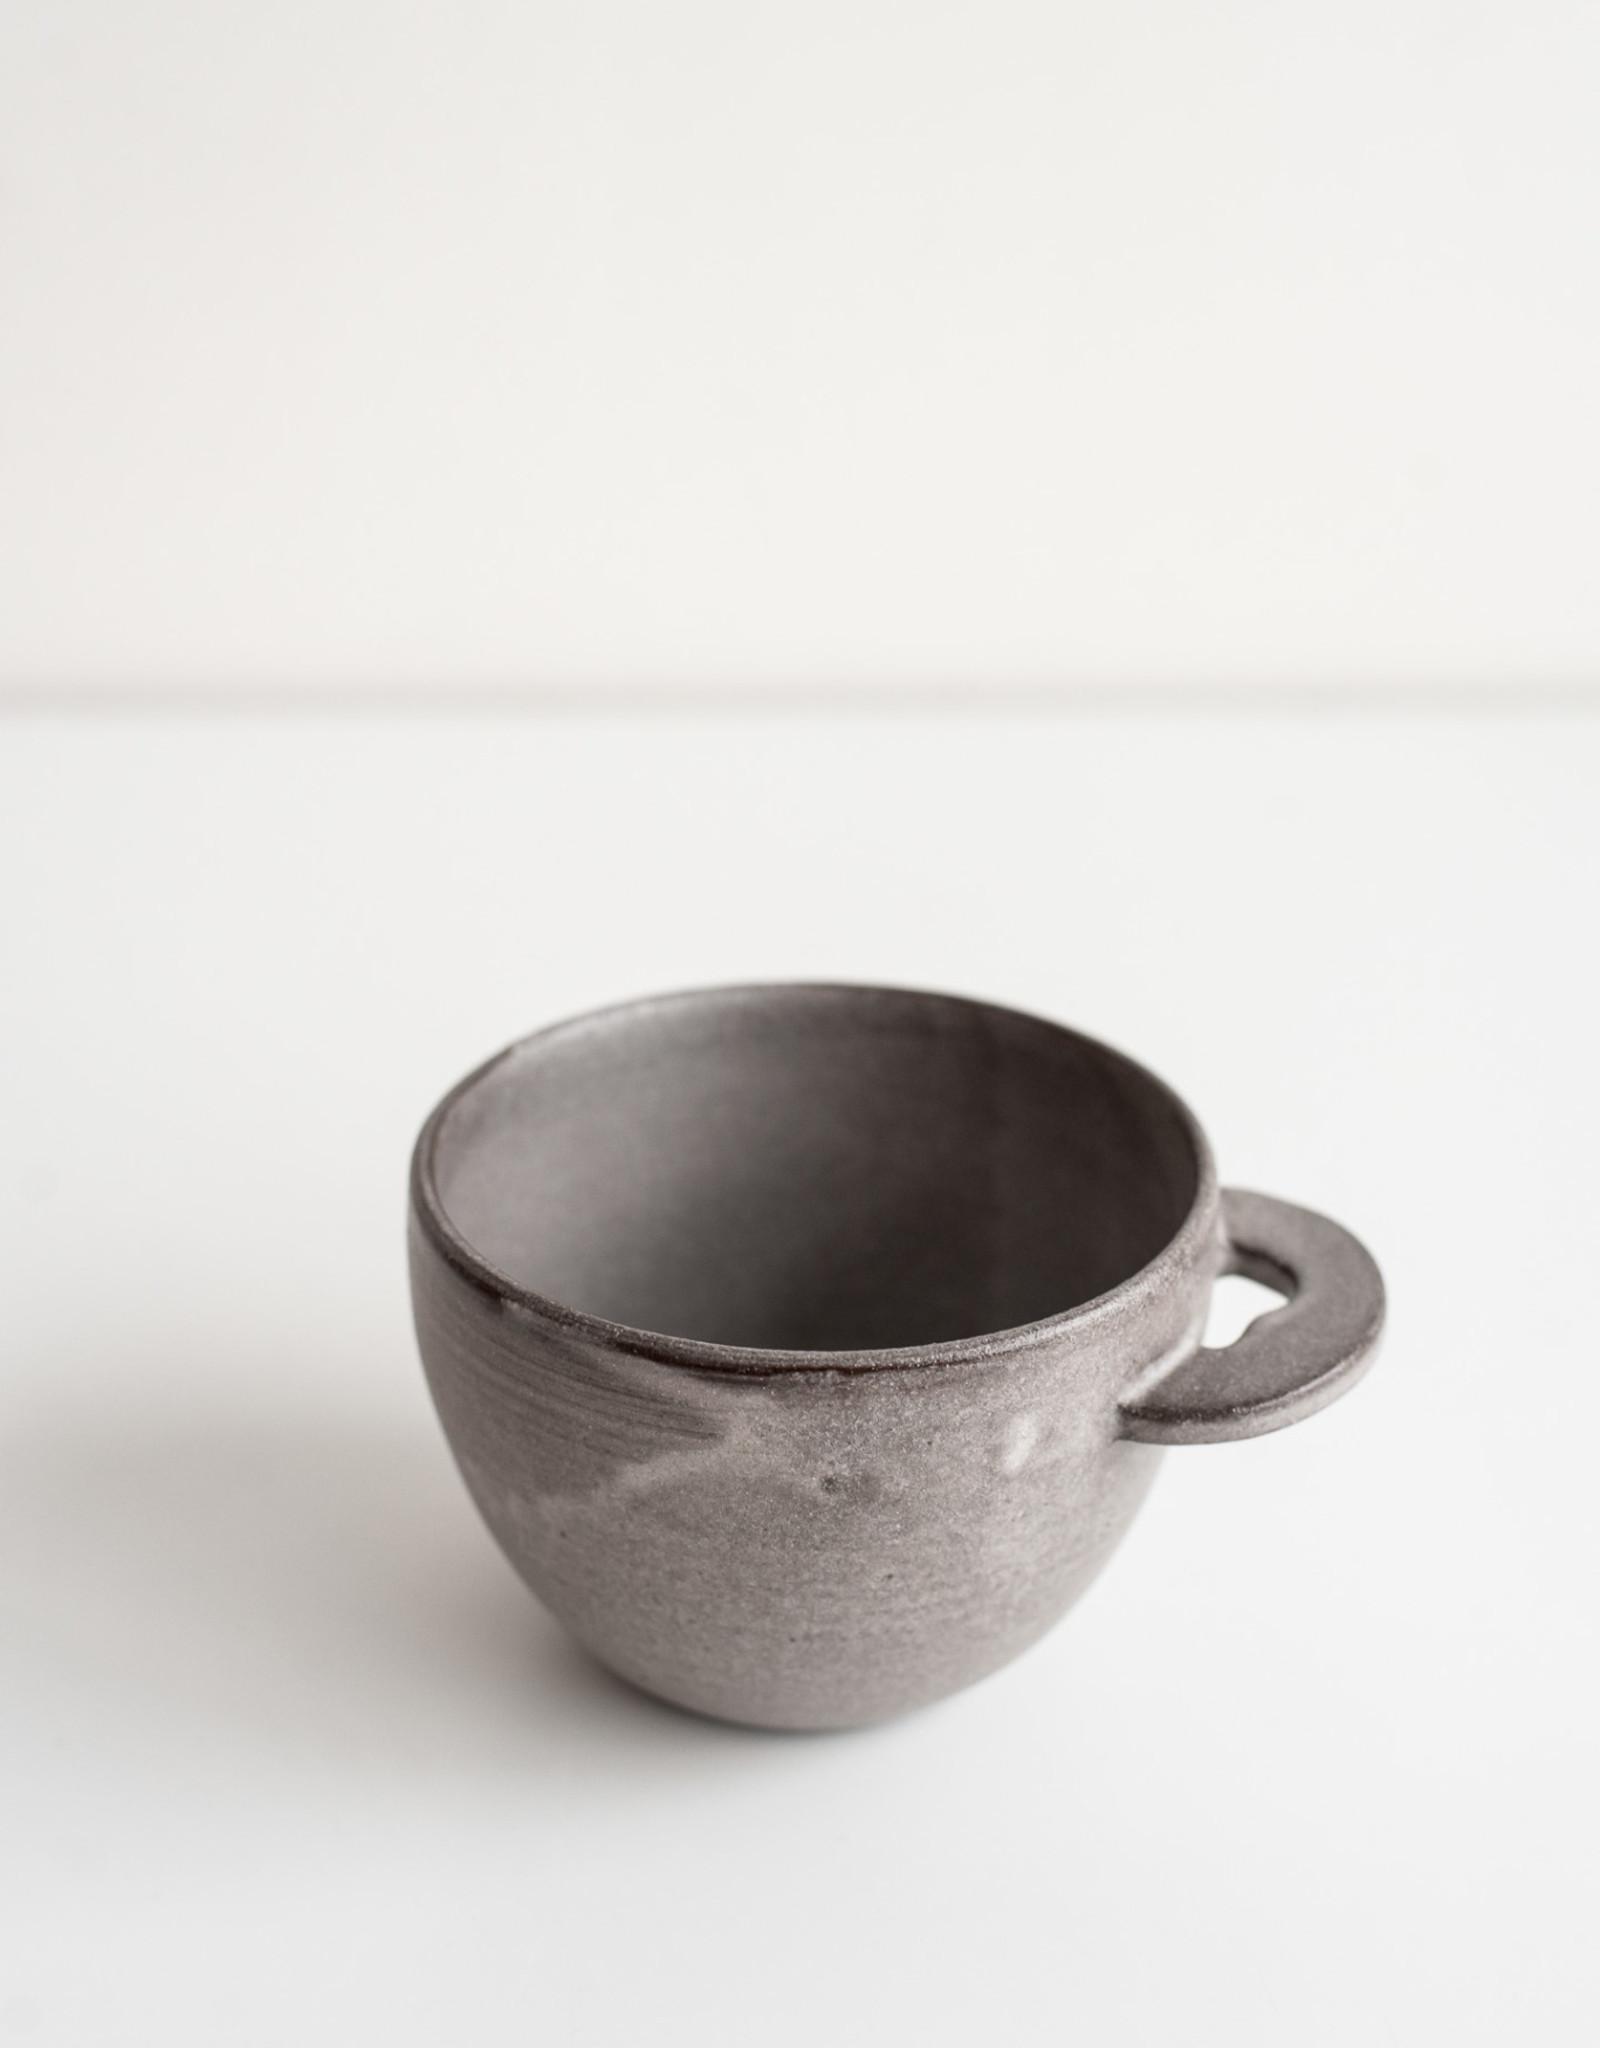 Roxane Charest Tasse Cappuccino